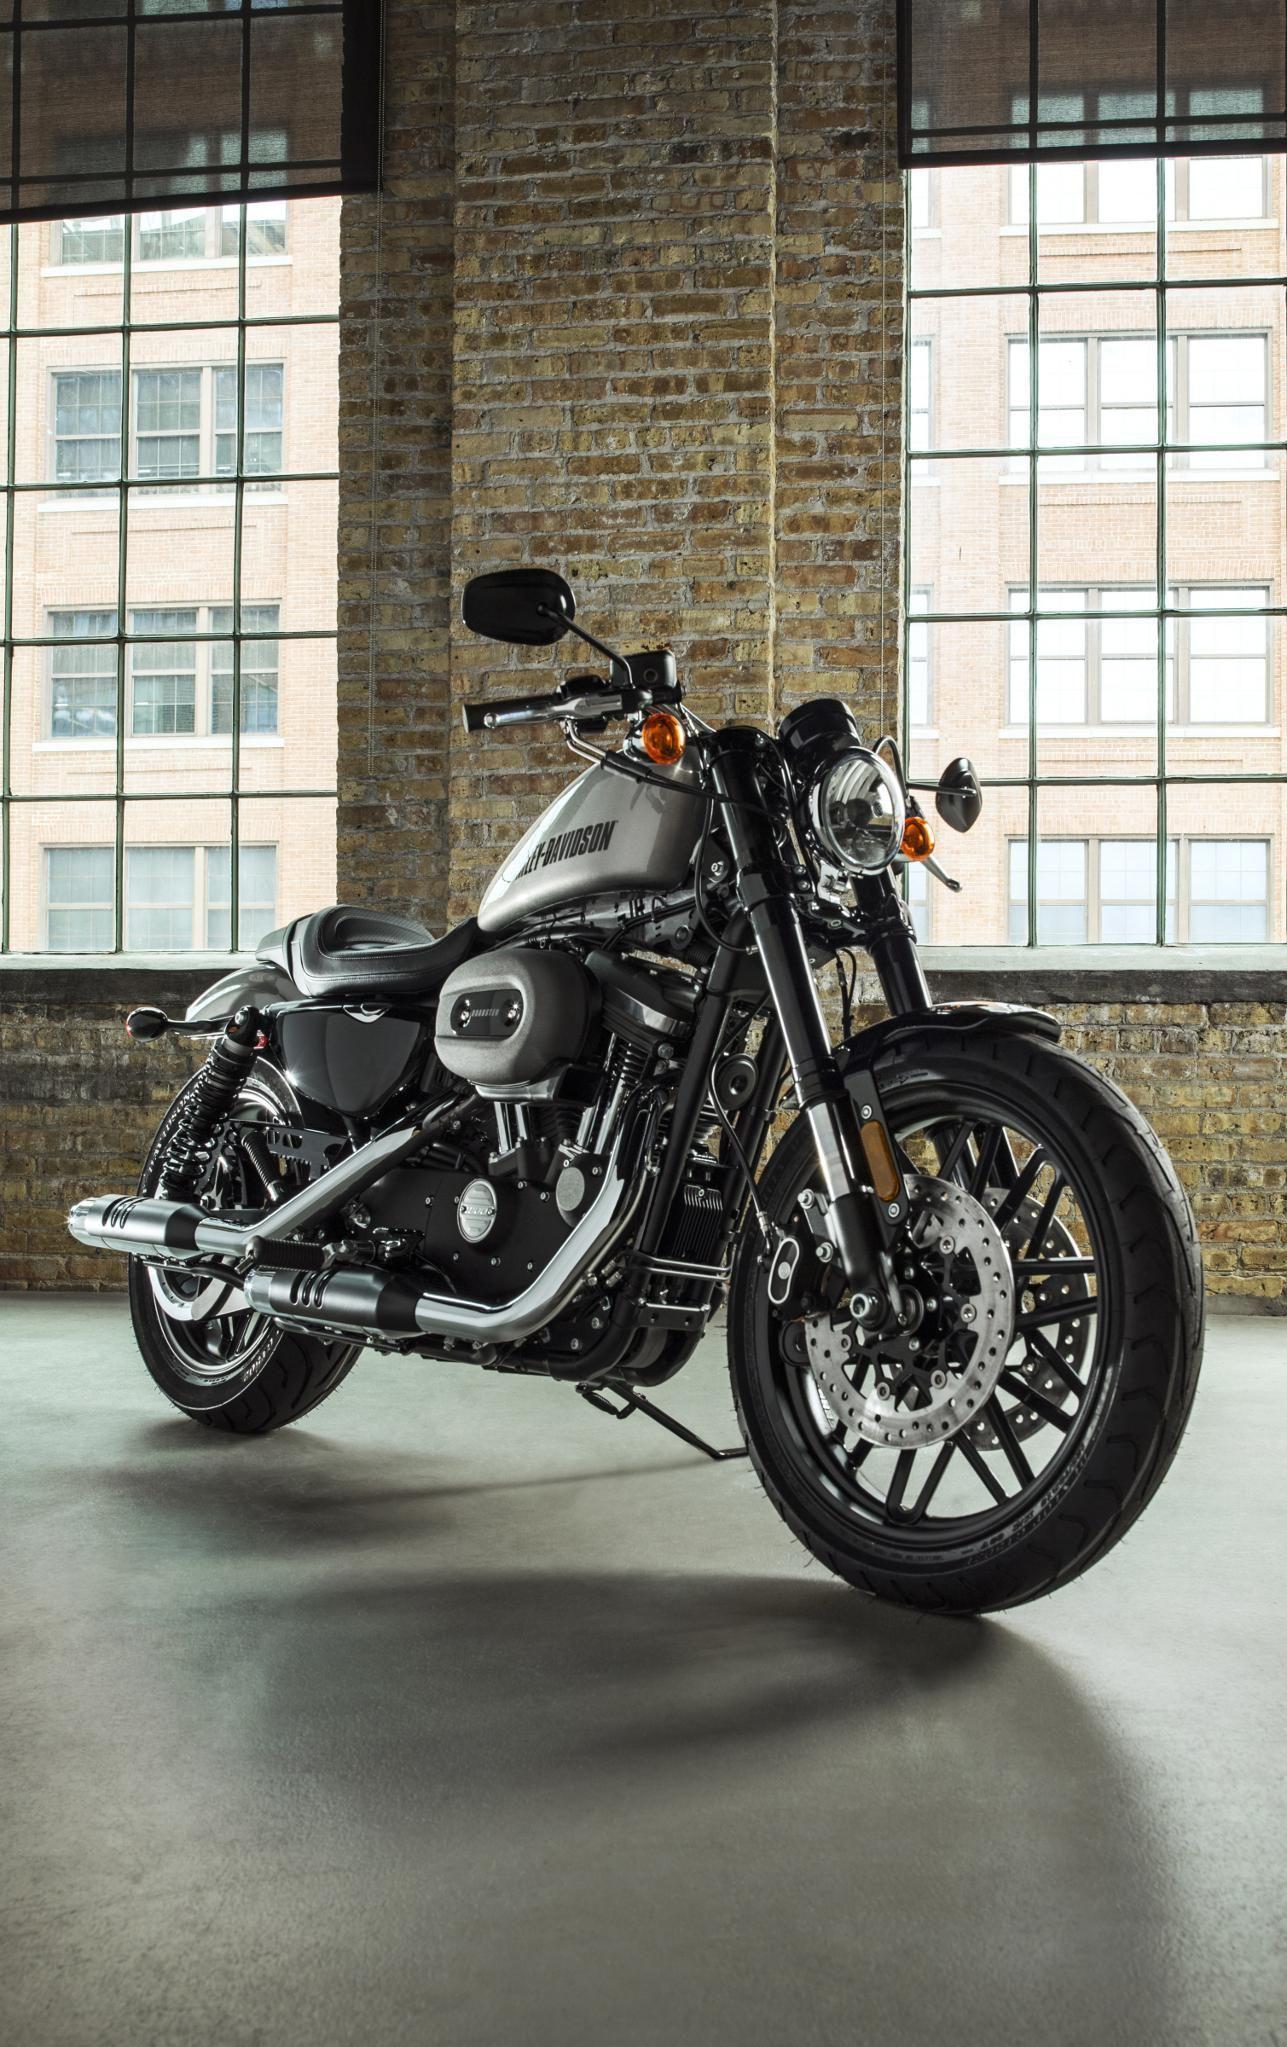 Desktop Wallpaper S Motorcycles Harley Davidson Xl 1200 Sportster 1200 Night Harley Davidson Roadster Harley Davidson Sportster Harley Davidson Night Train